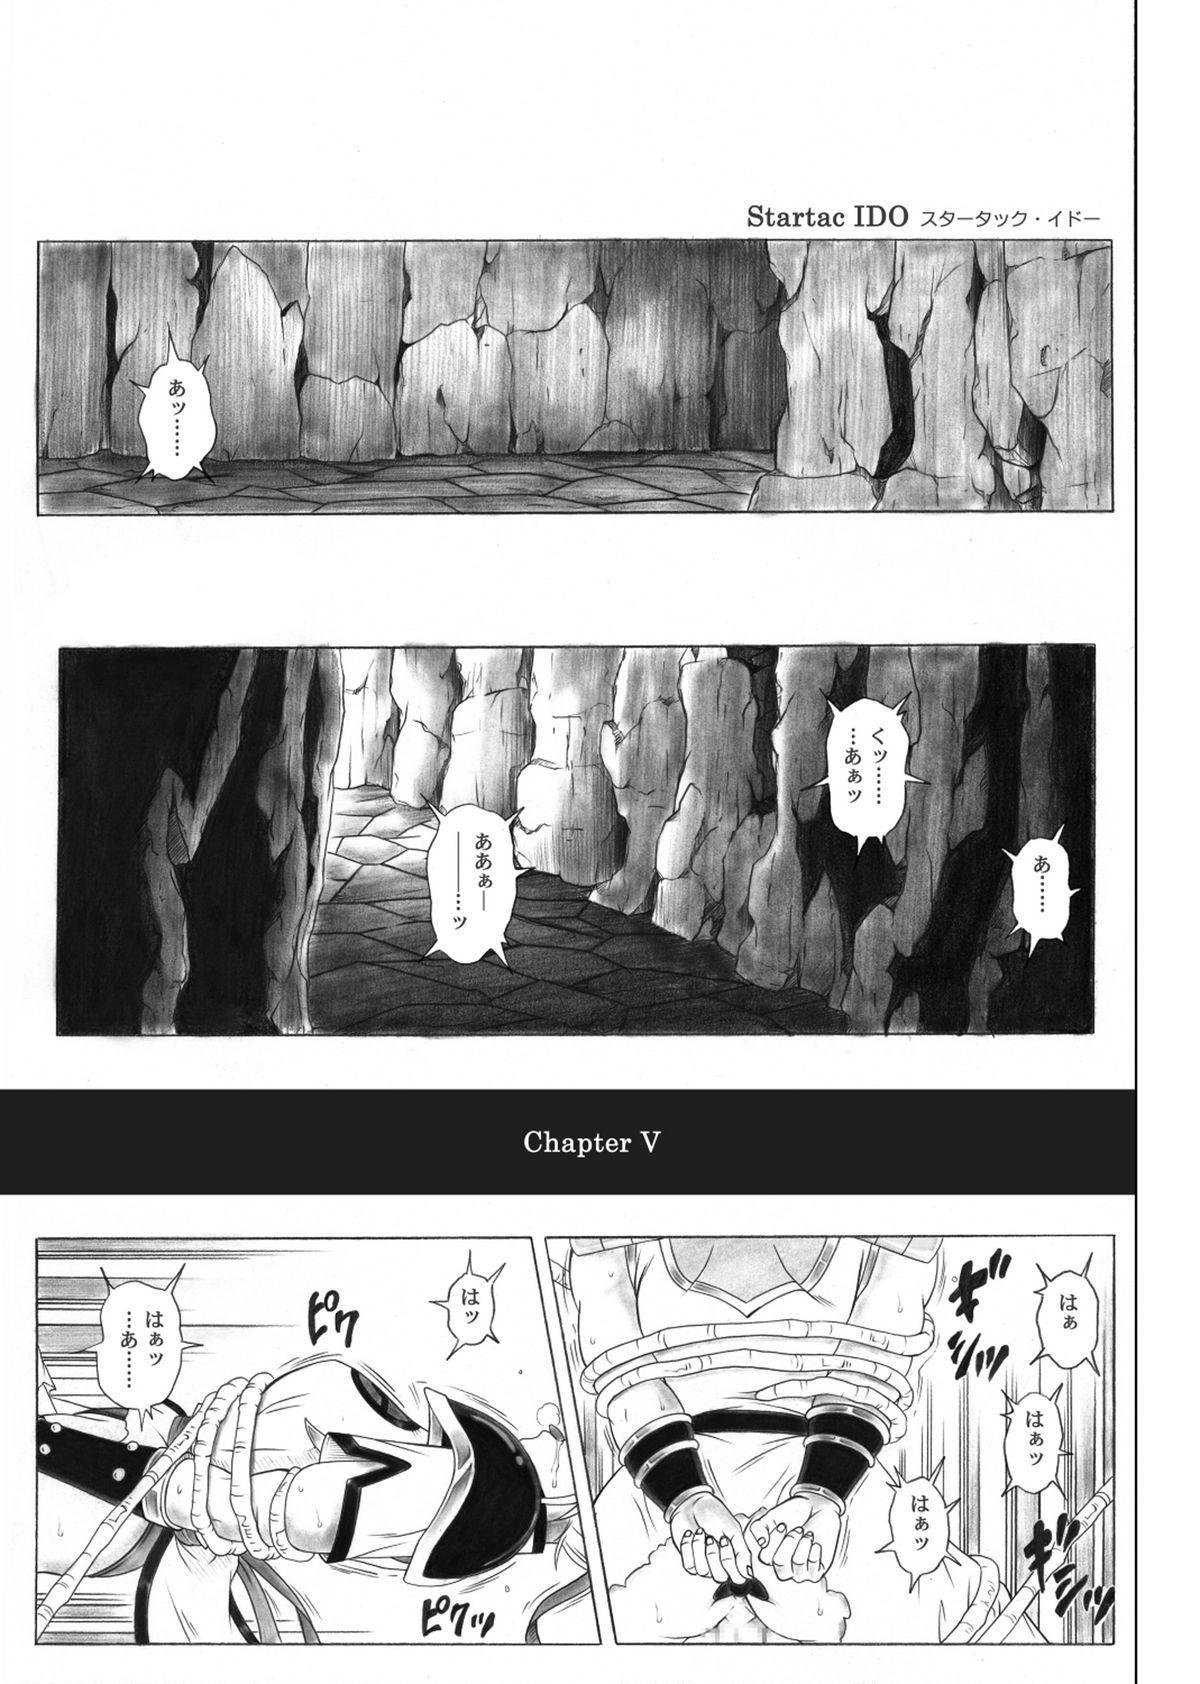 [Cyclone (Reizei, Izumi)] STAR TAC IDO ~Youkuso Haja no Doukutsu he~ Chuuhen Download edition (Dragon Warrior: Dai's Great Adventure) [Digital] 36